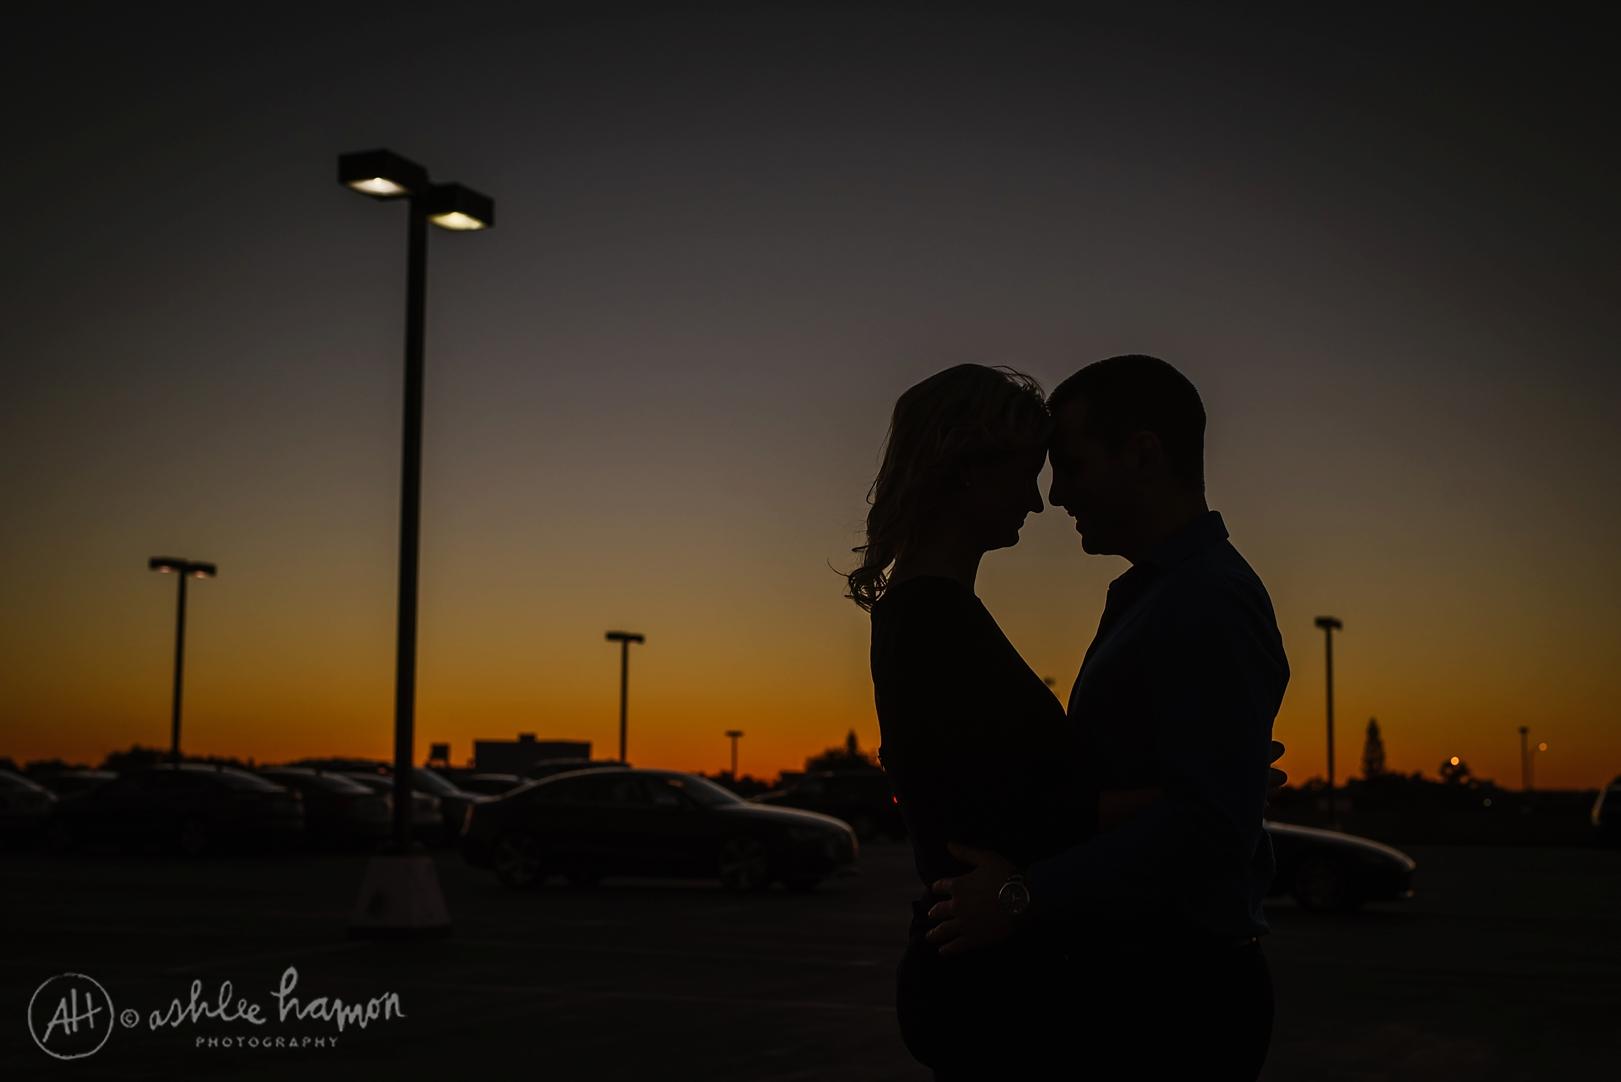 romantic-waterfront-engagement-photography-ashlee-hamon_0012.jpg